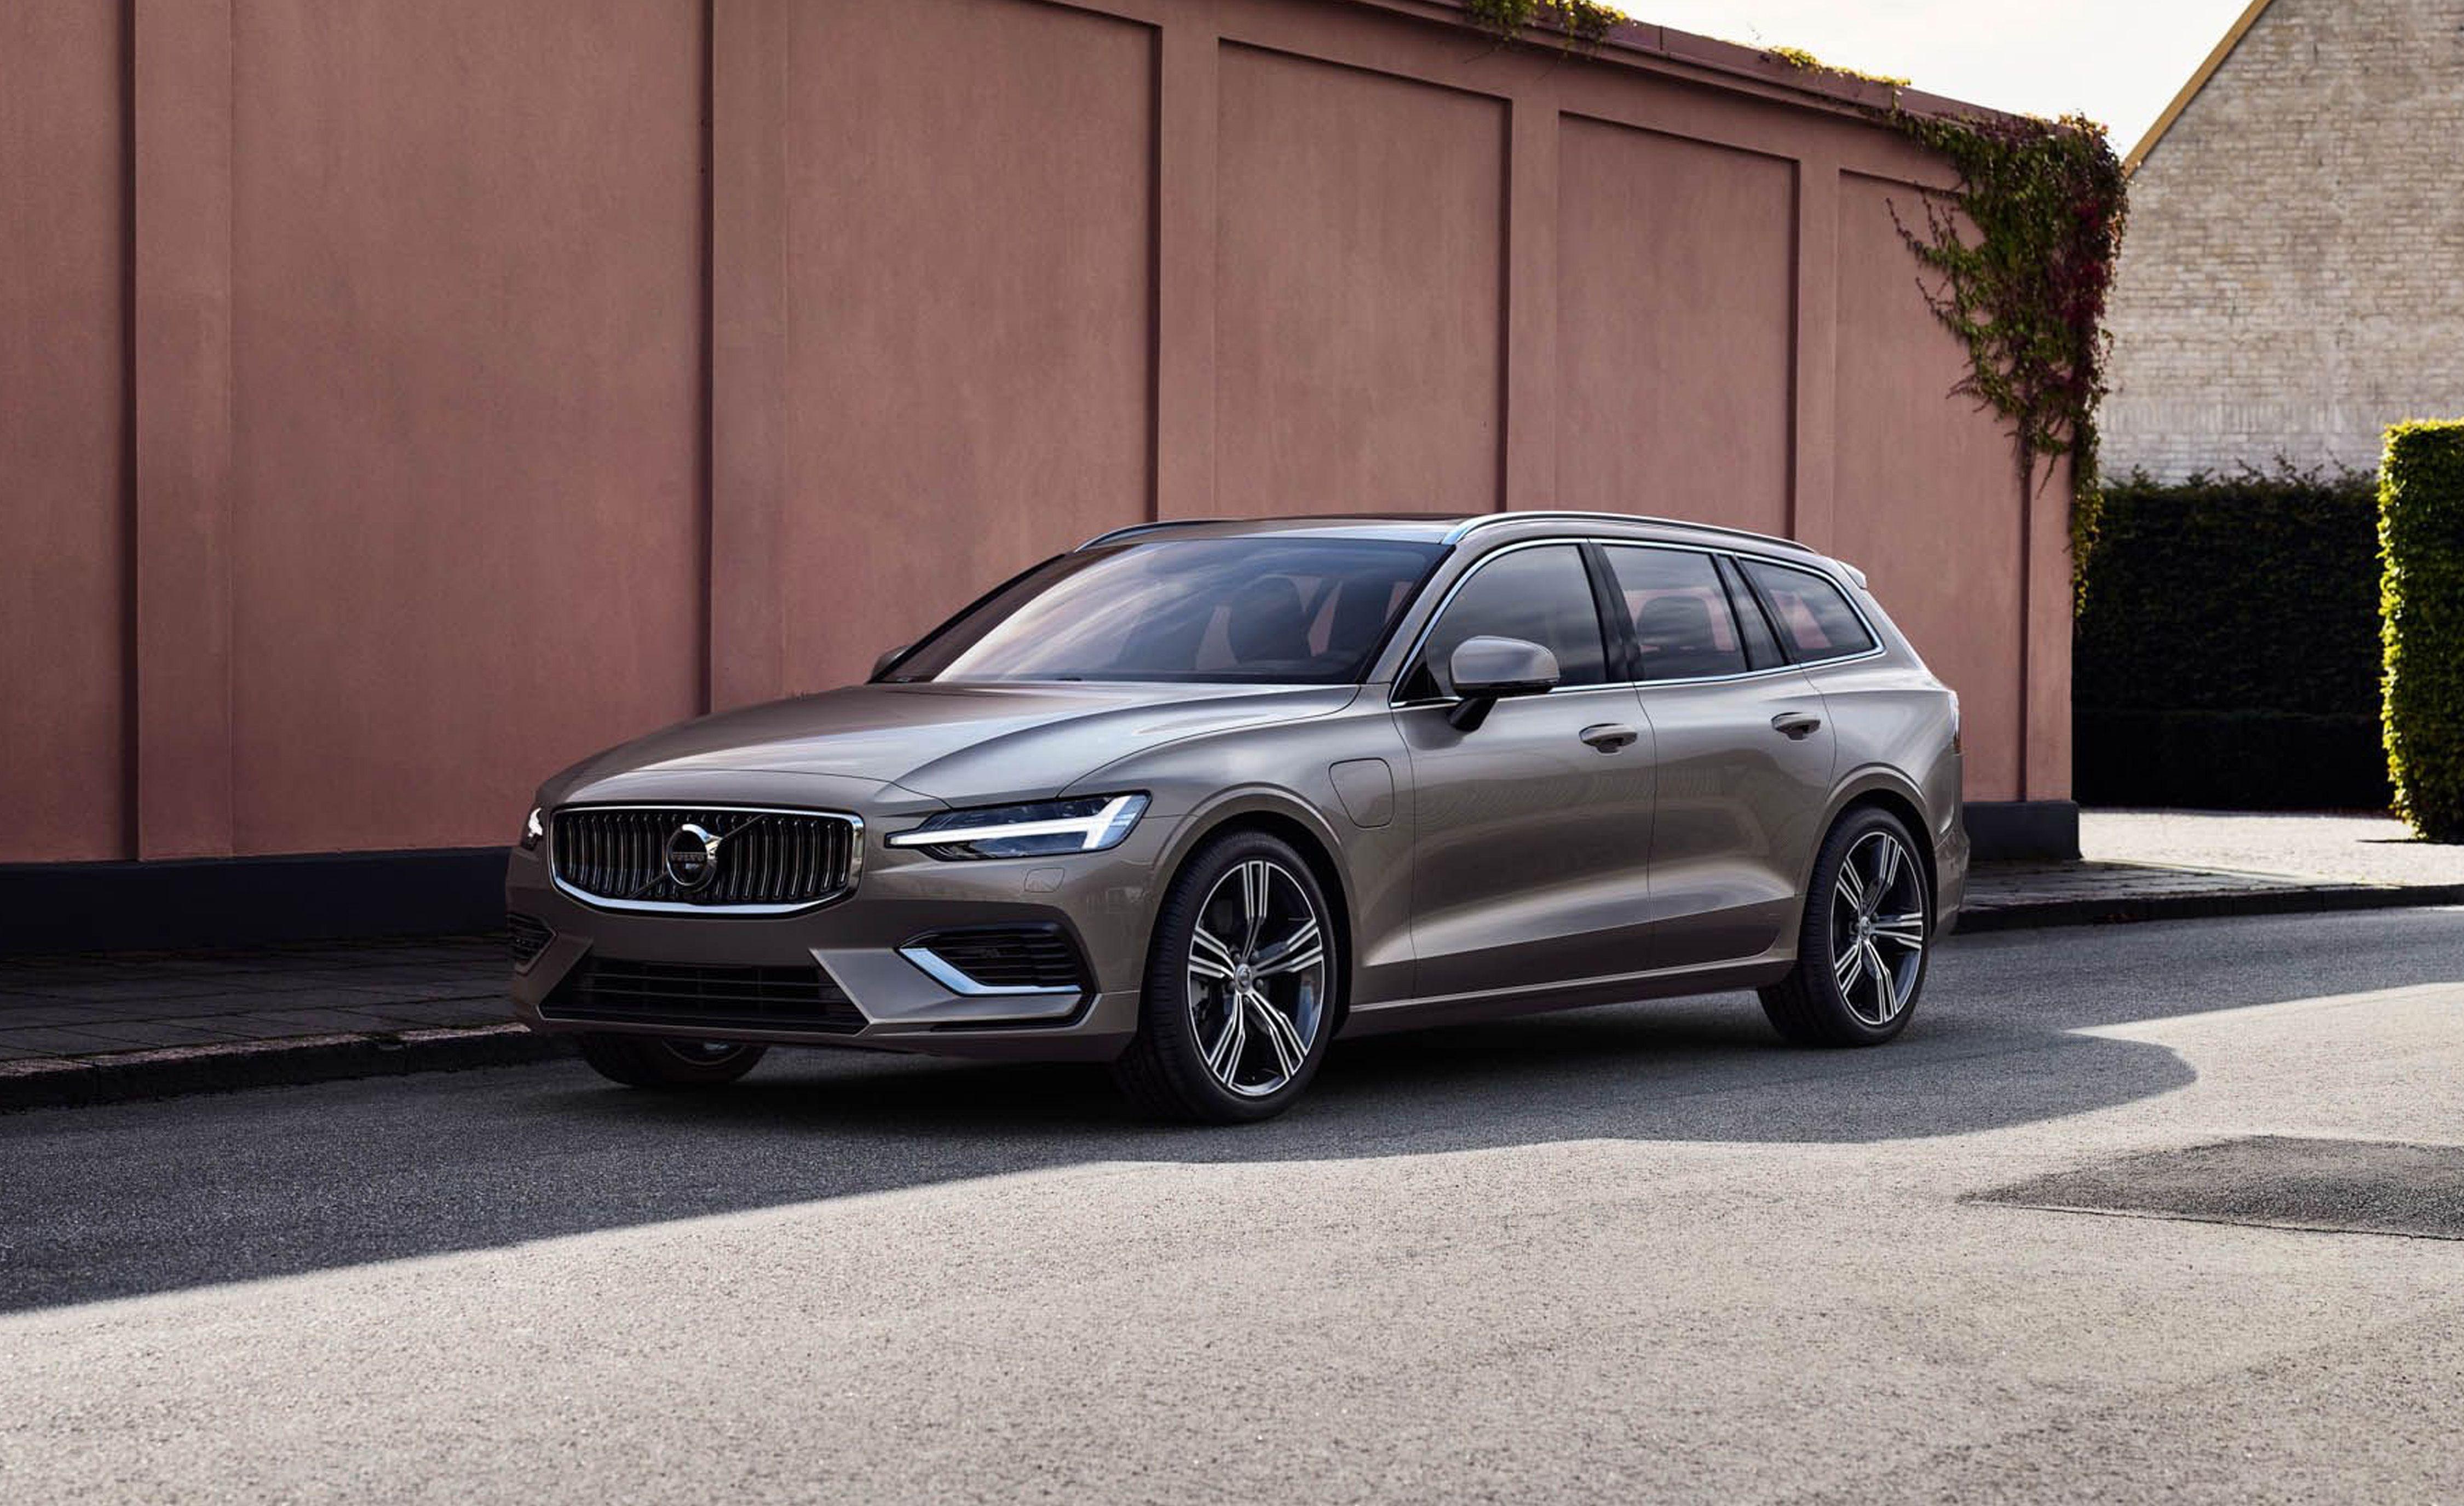 Dodge Ram Build And Price >> 2020 Volvo V60 Reviews | Volvo V60 Price, Photos, and Specs | Car and Driver